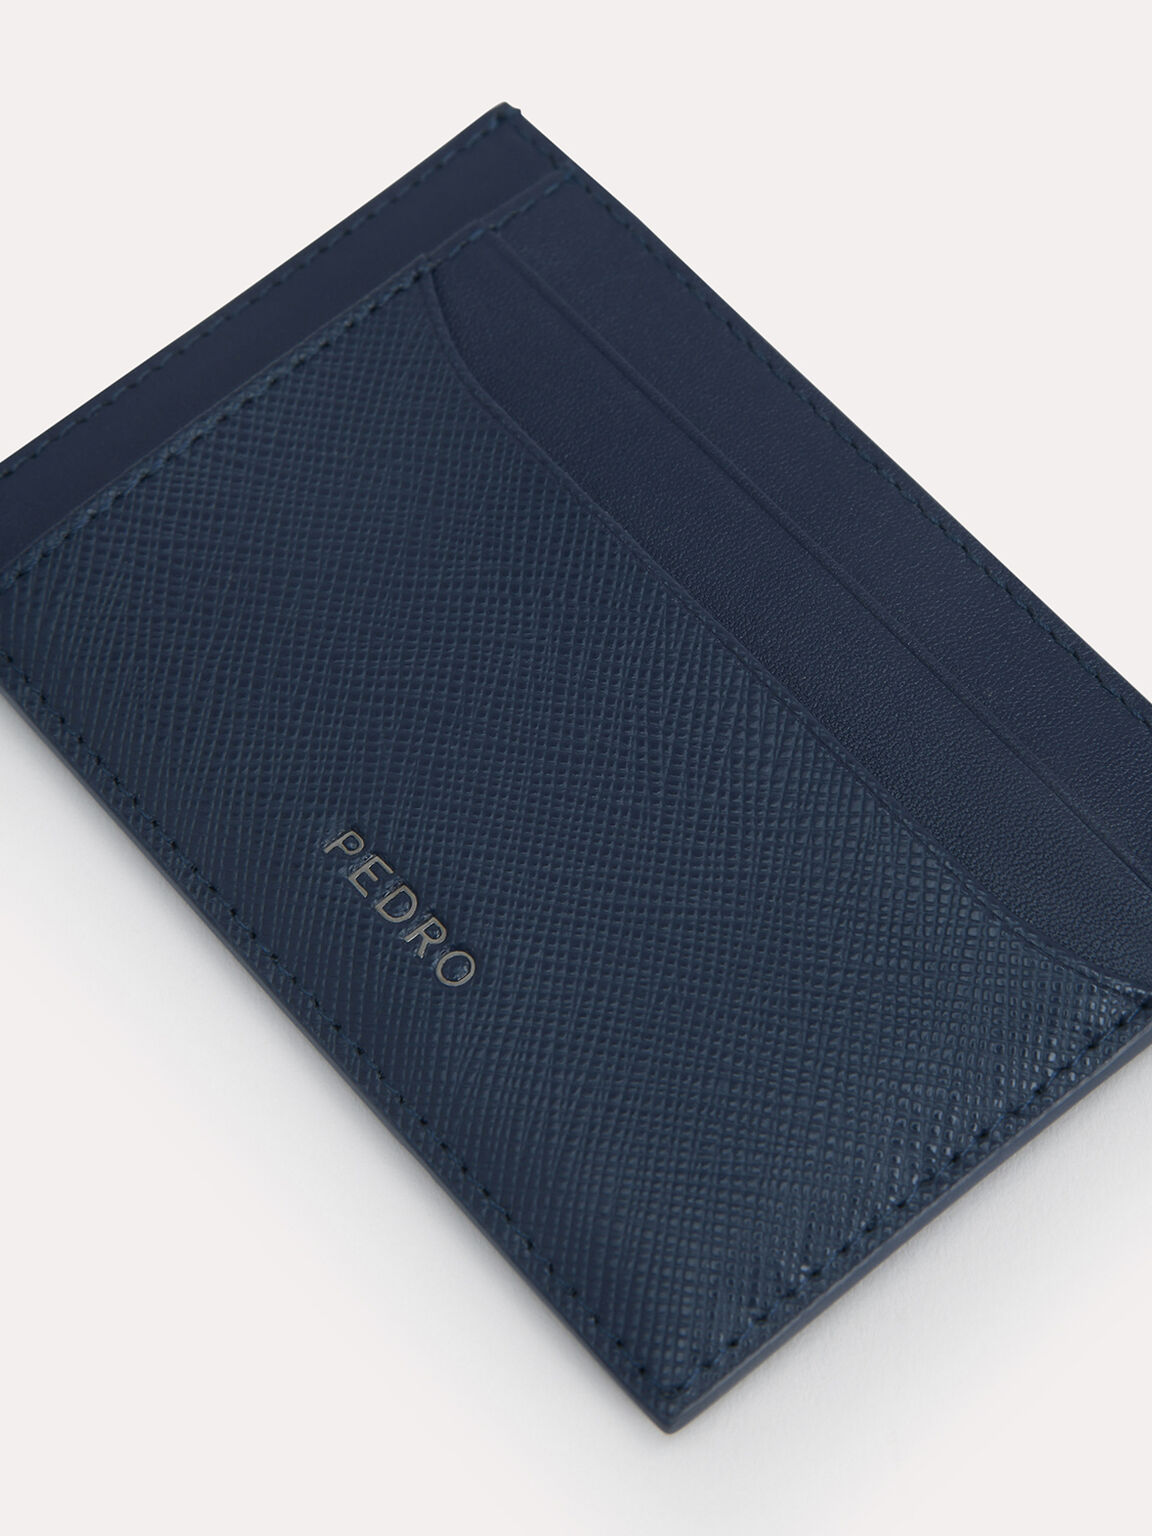 Textured Leather Cardholder, Navy, hi-res